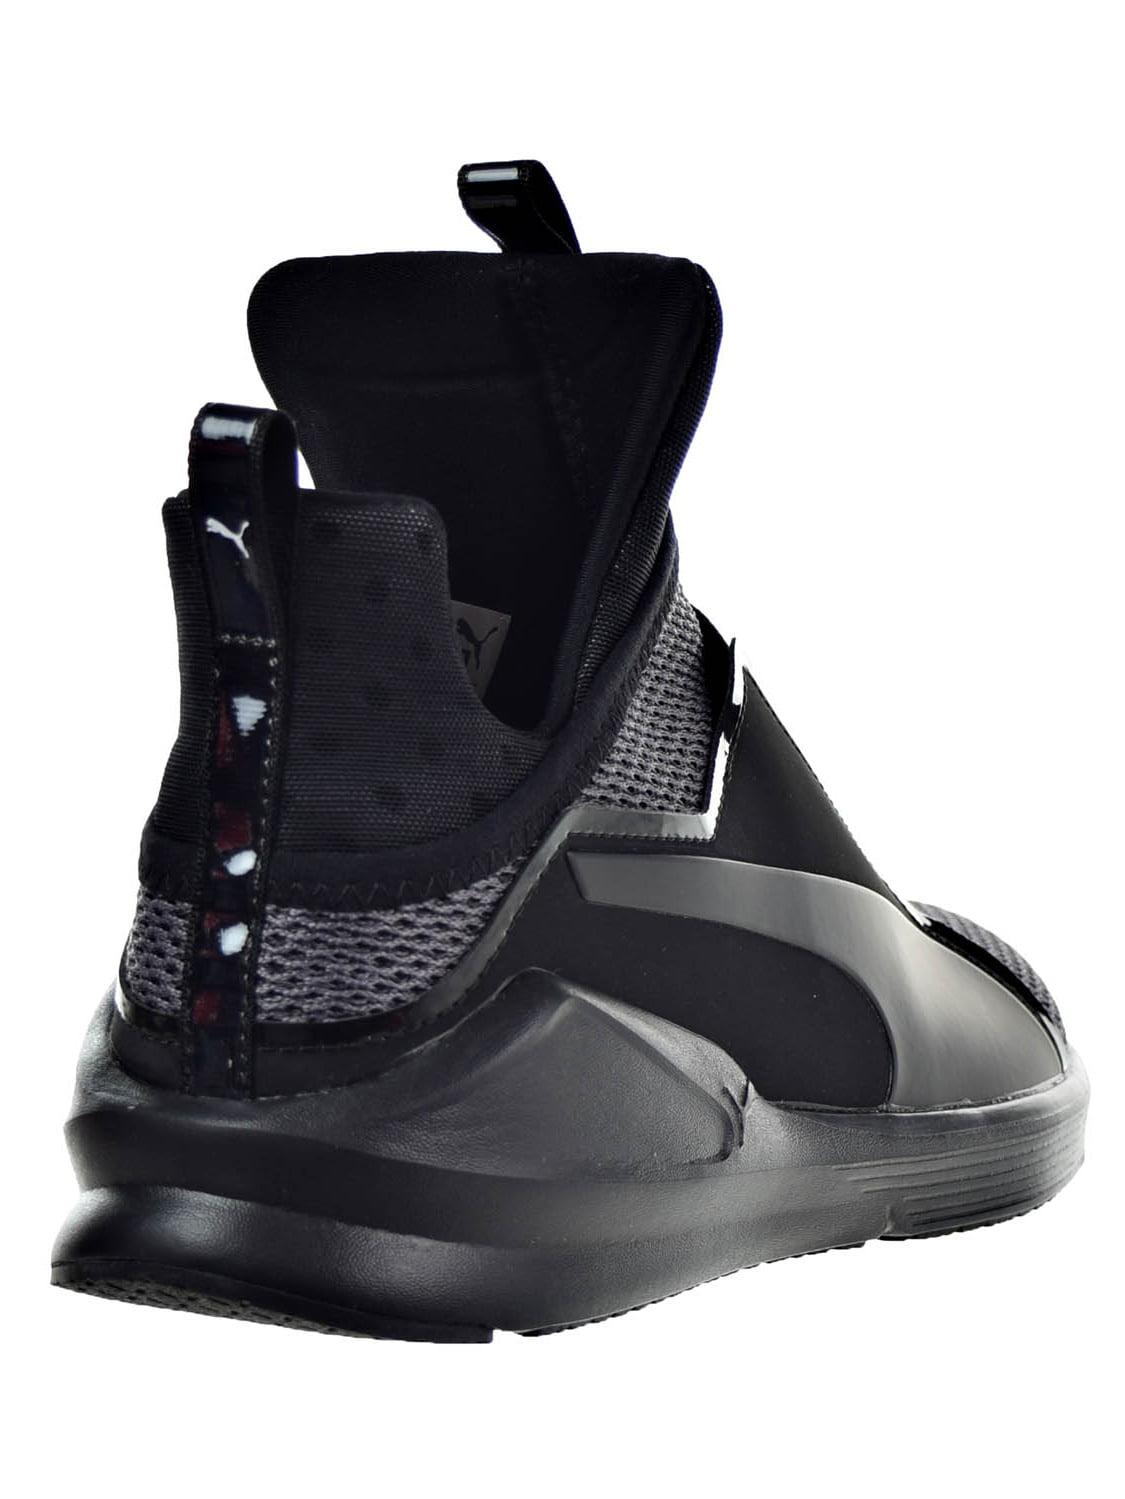 Puma Fierce Knit Women's Training Shoes Black/Black 190303-01